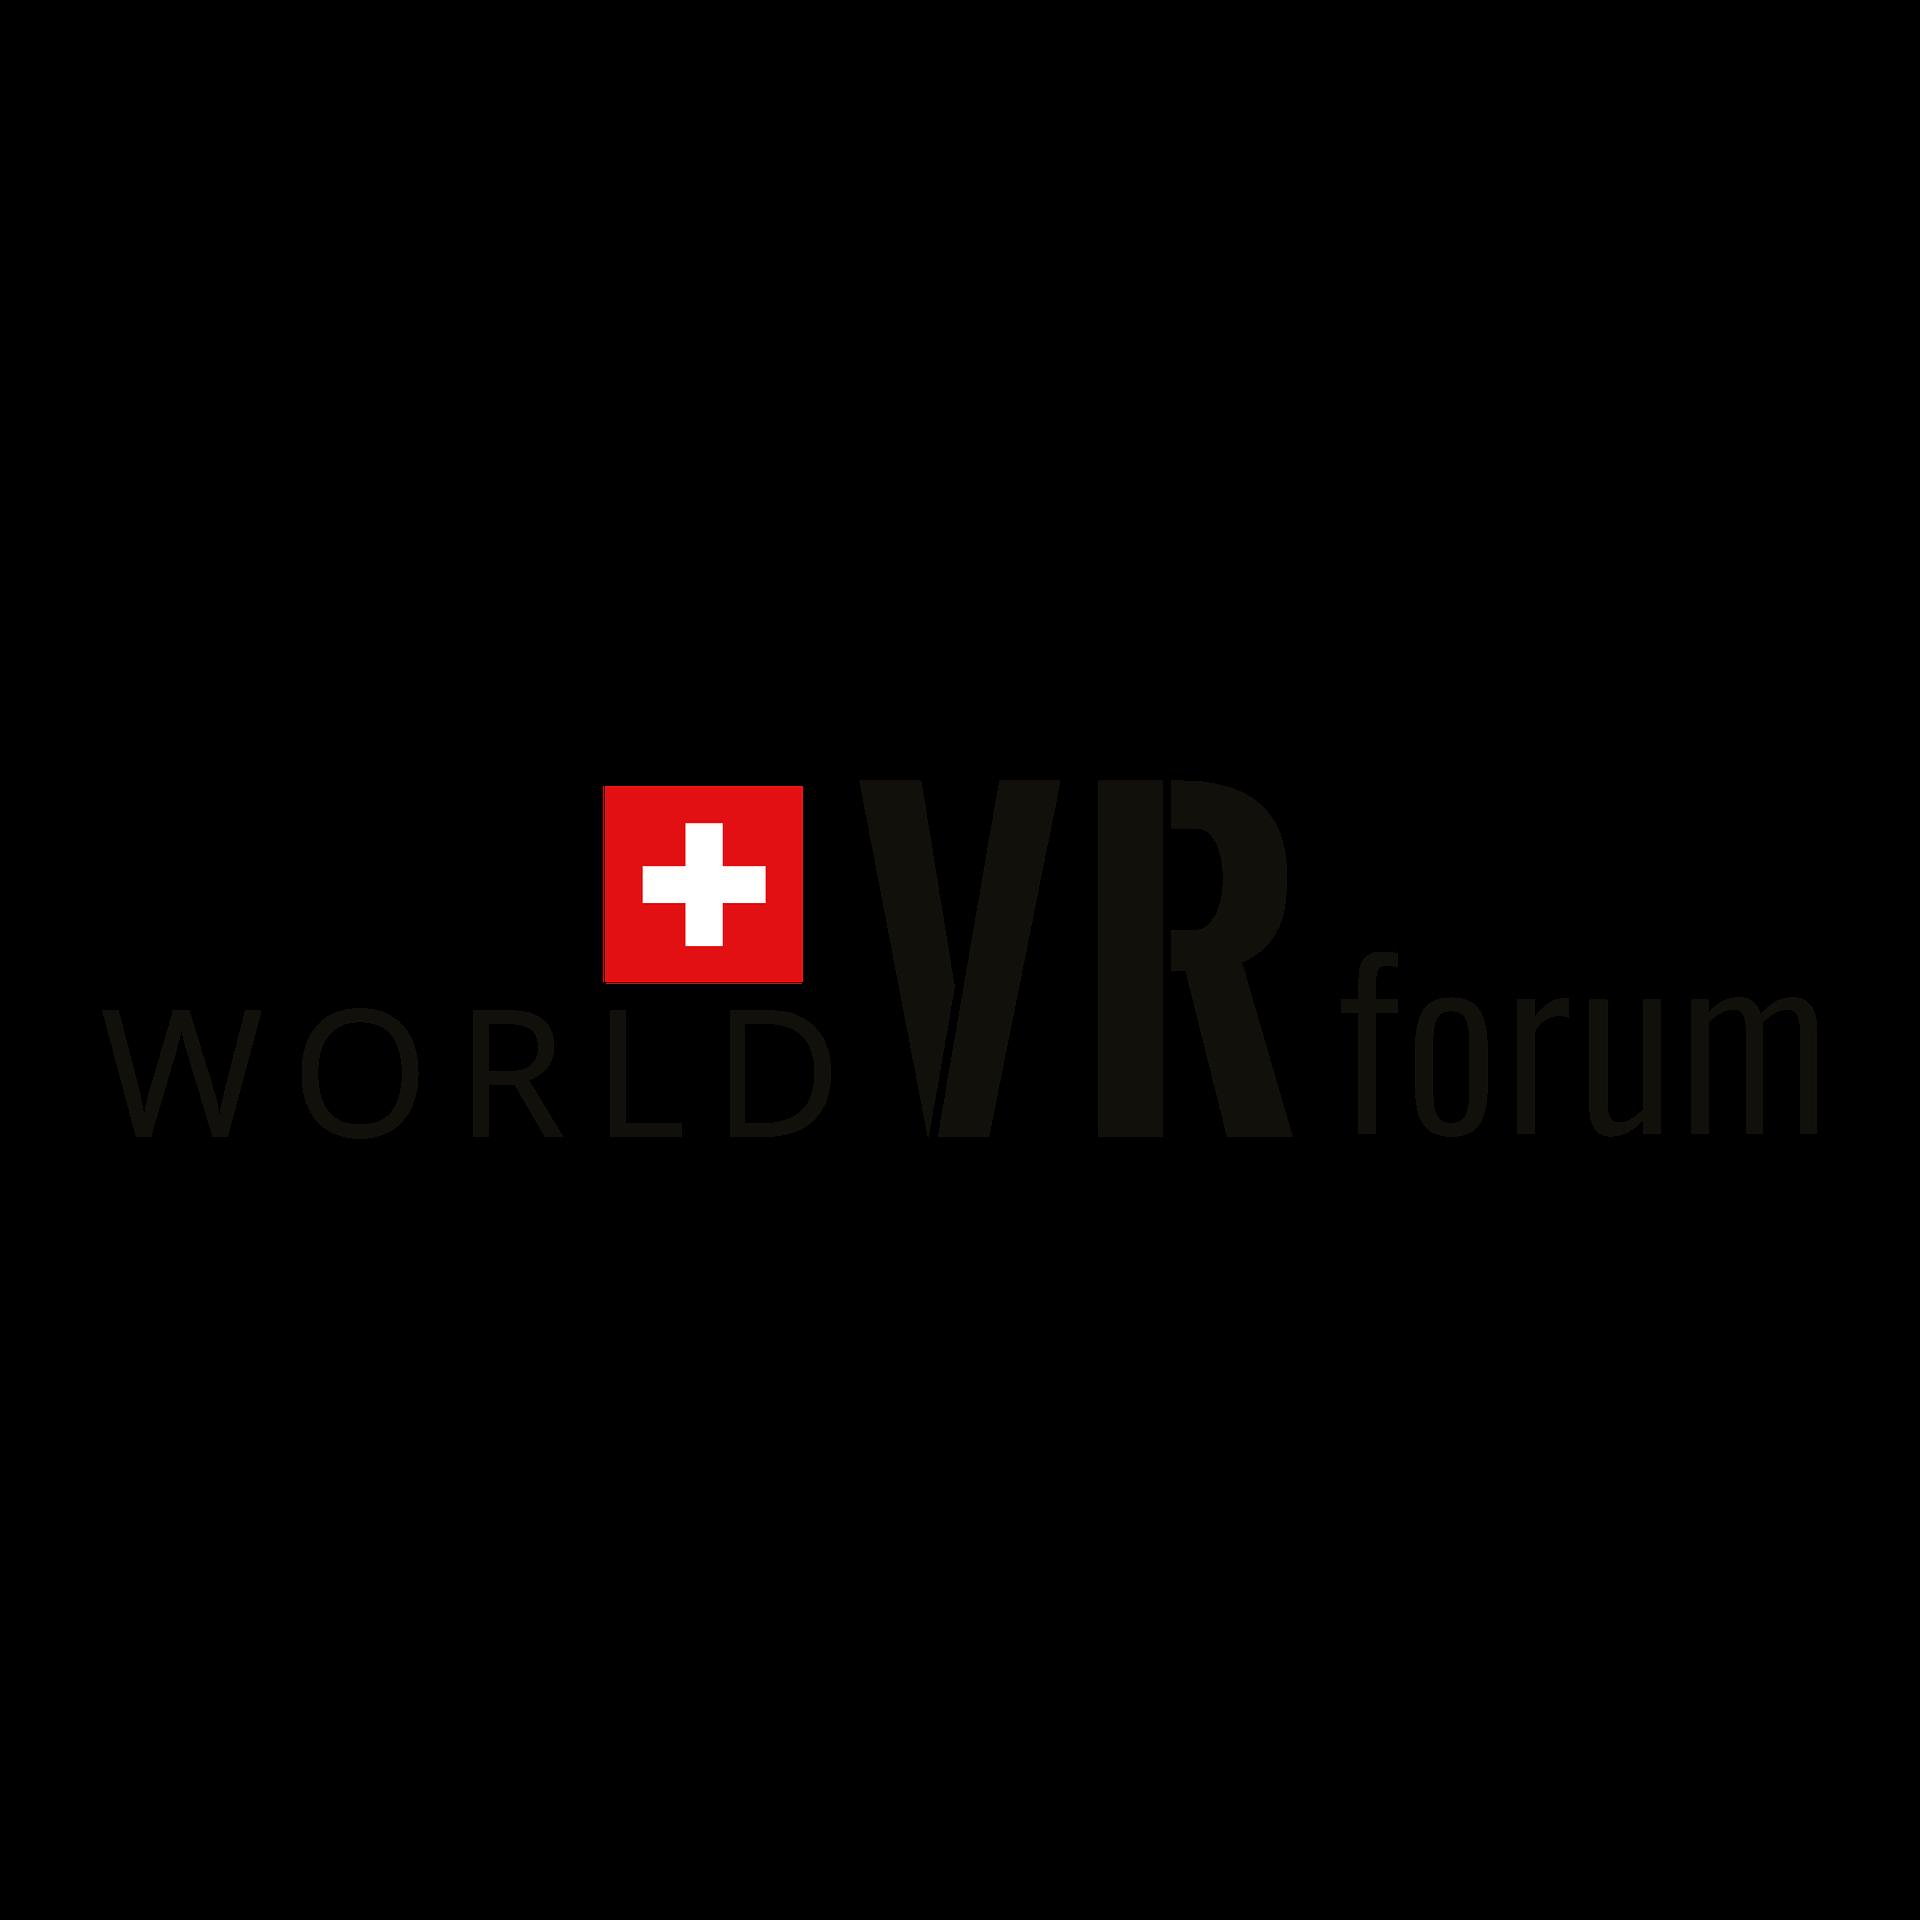 world vr forum logo